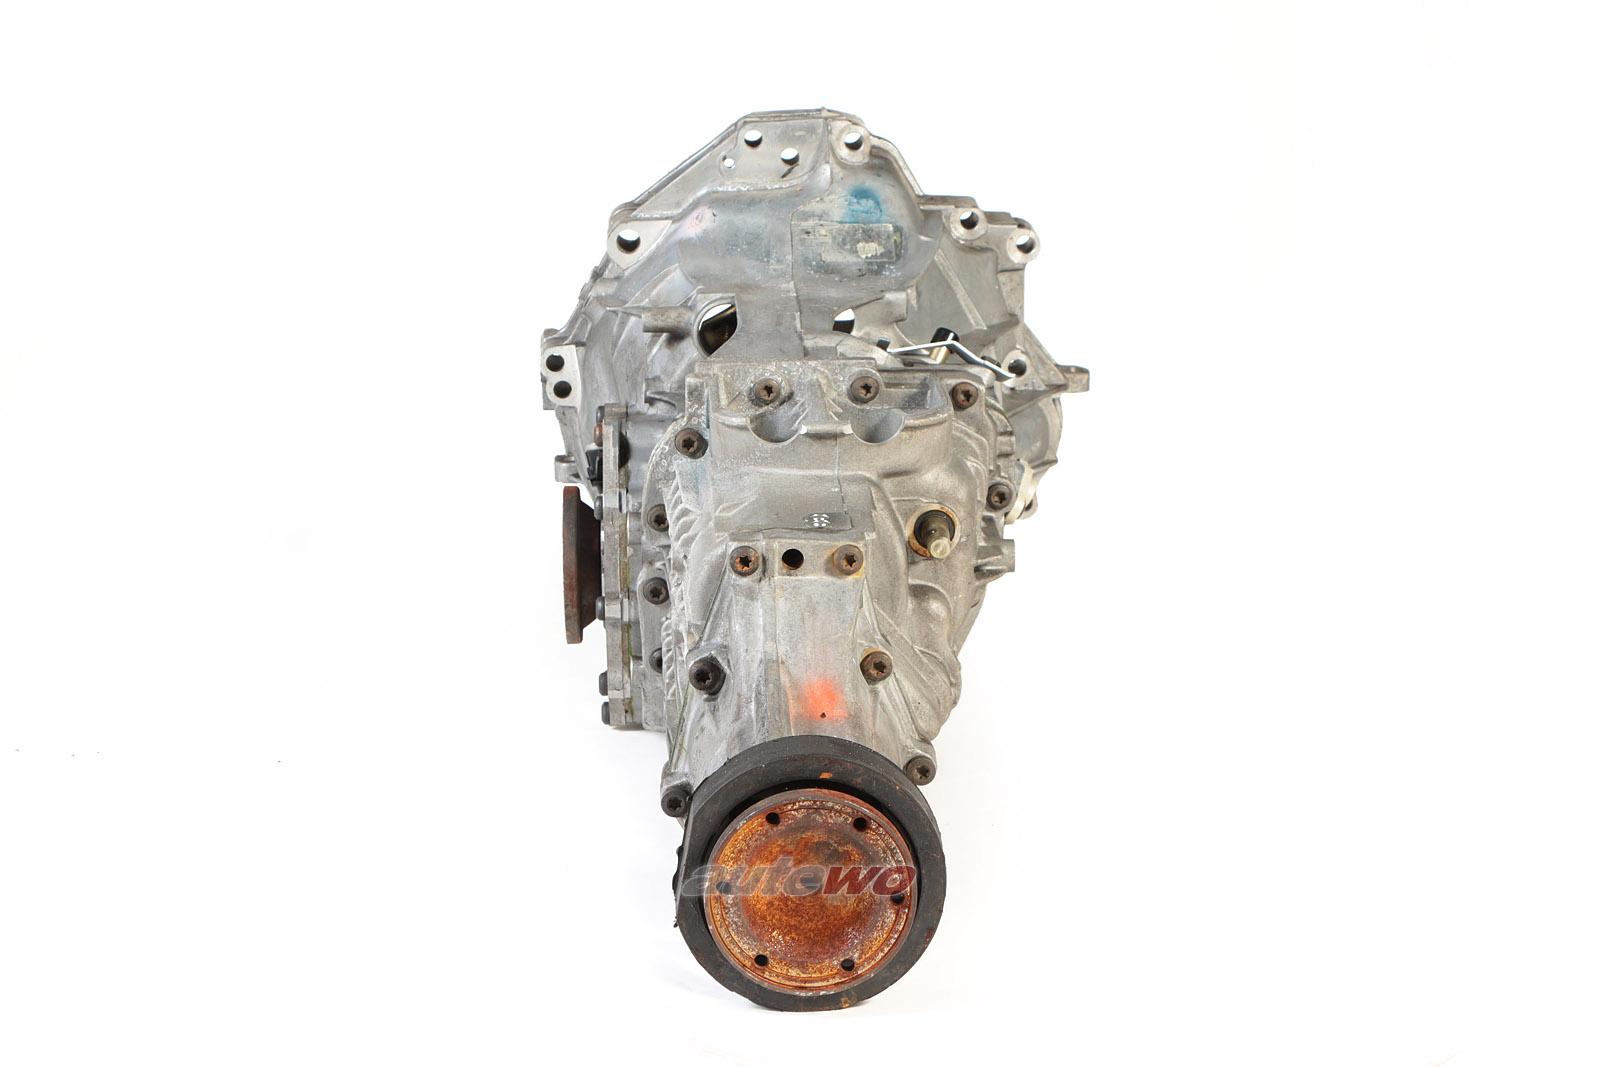 01A300042F NEU Audi 80 Typ 89/100 44 1.8-2.0l Quattro-Schaltgetriebe AXK 05023